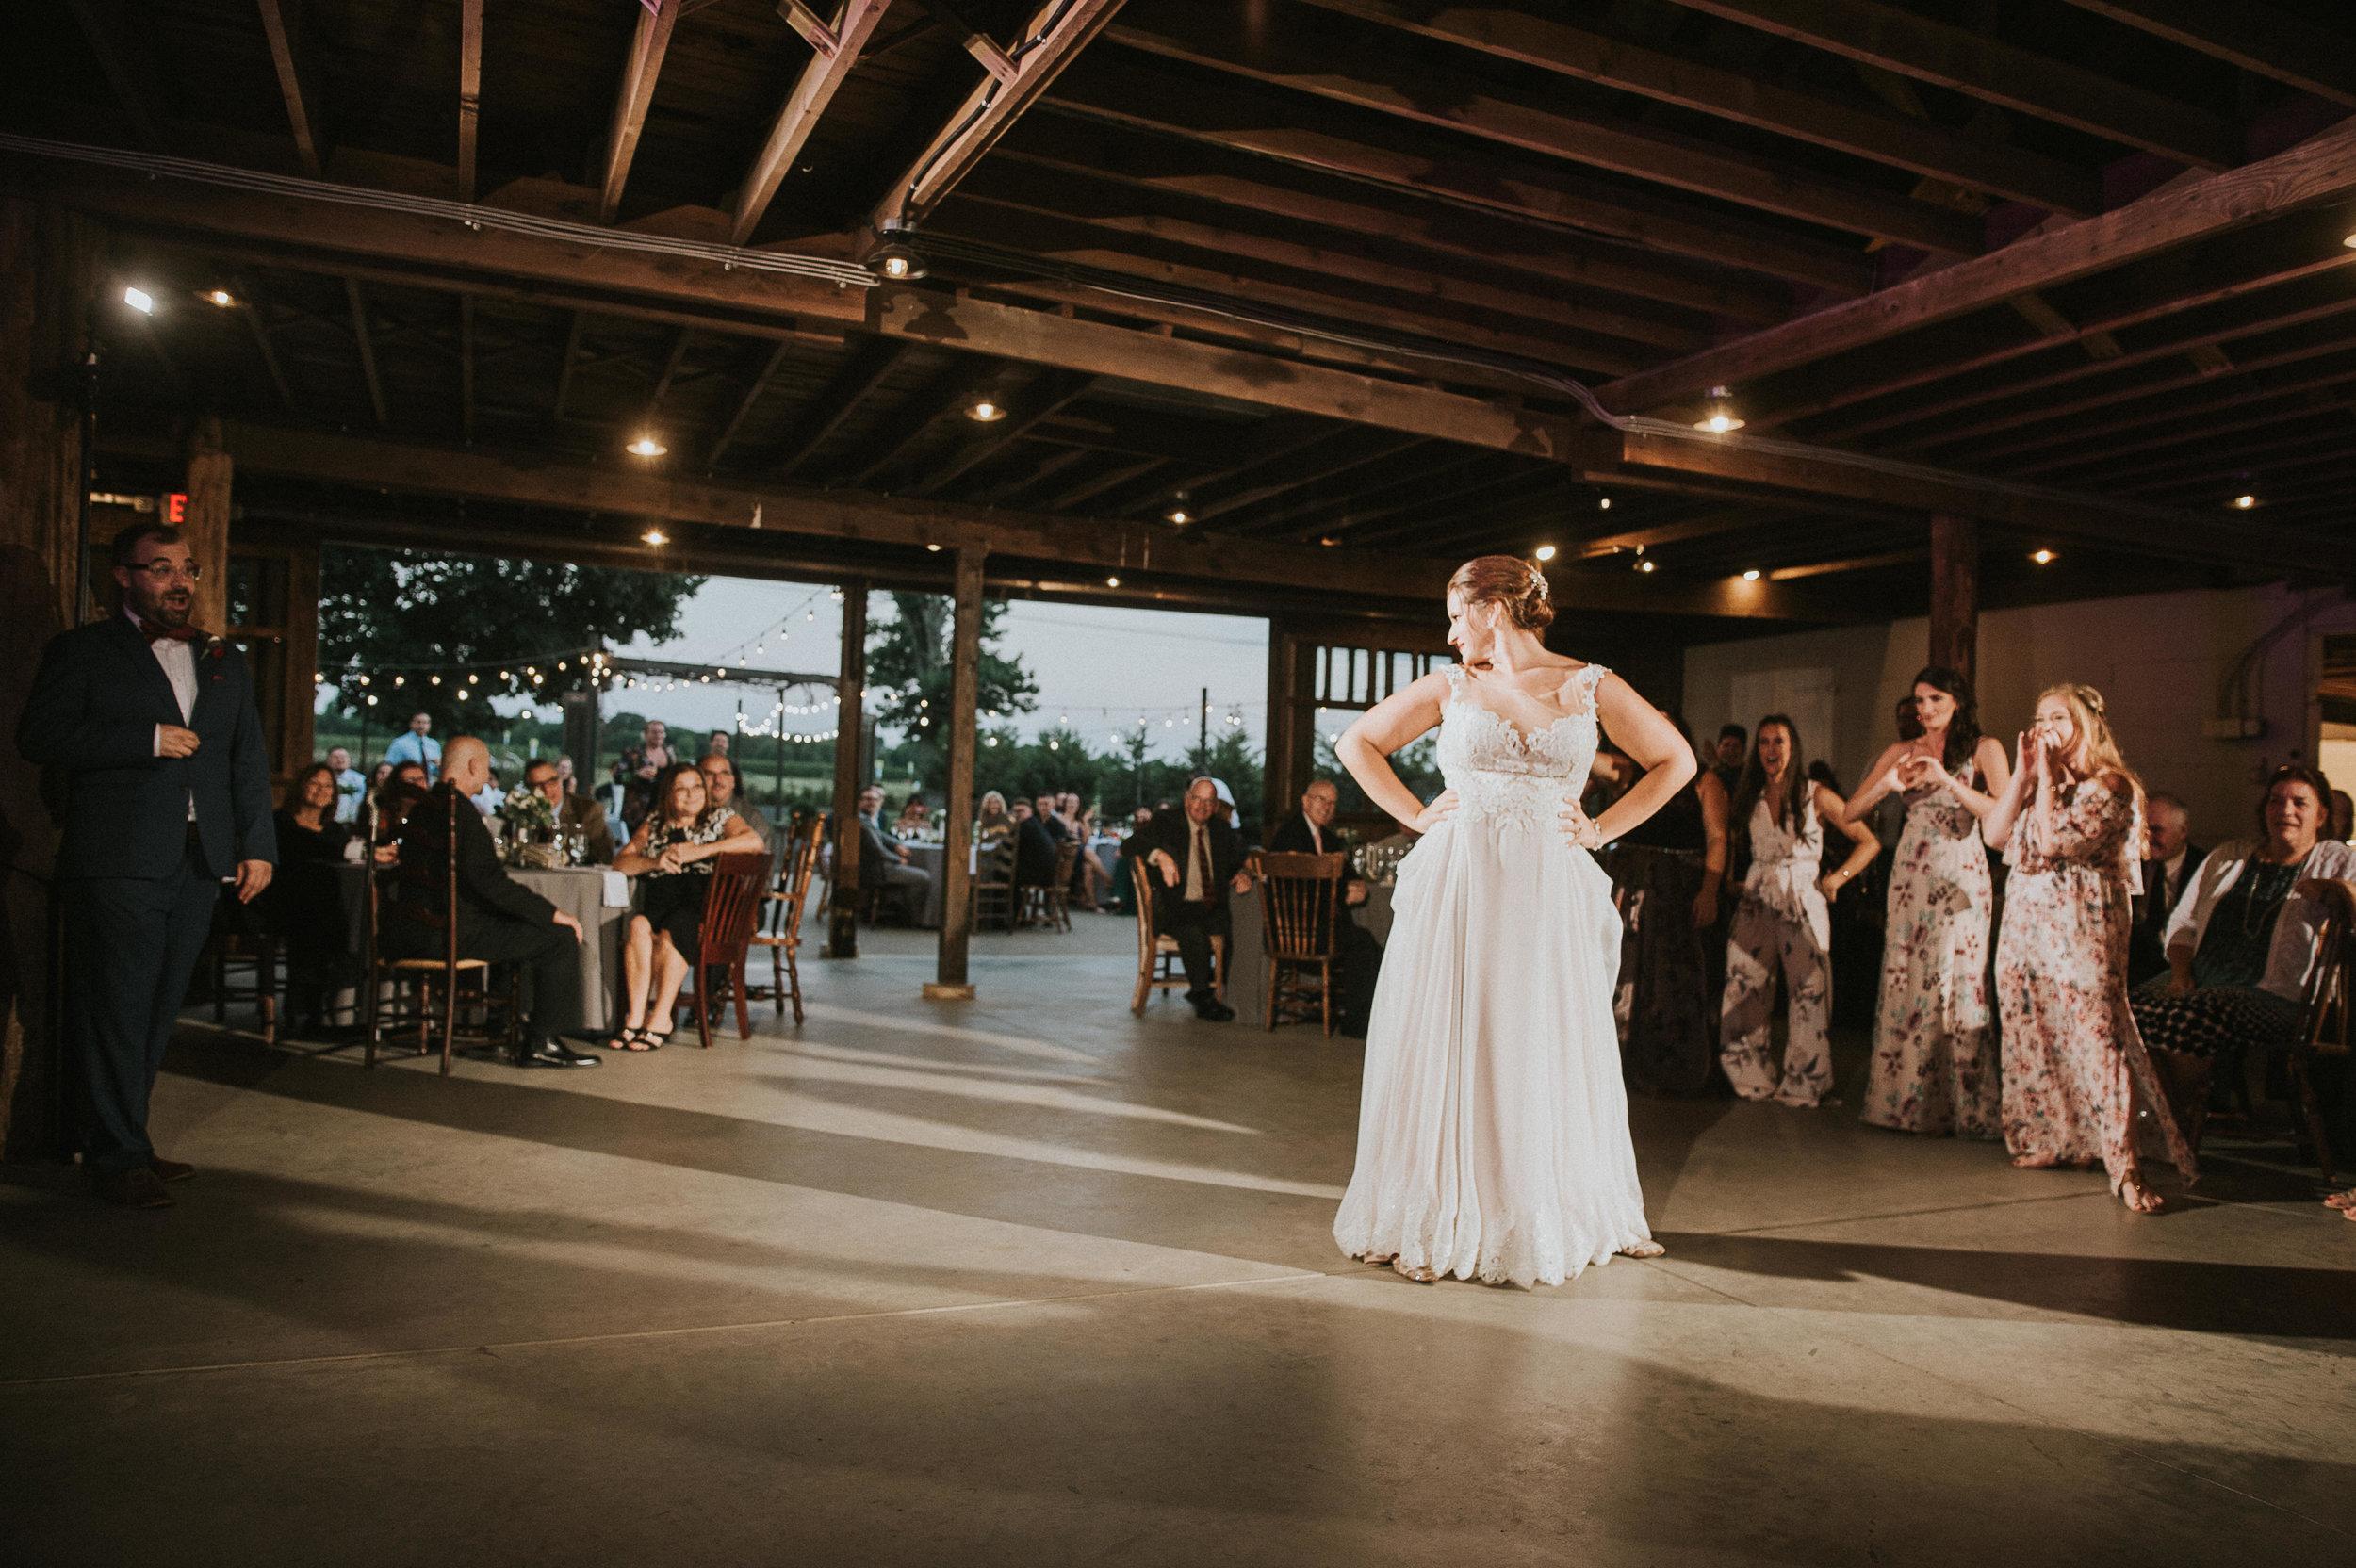 Johnson-Locust-Hall-Farm-Wedding-Christine-Kevin-1219.jpg